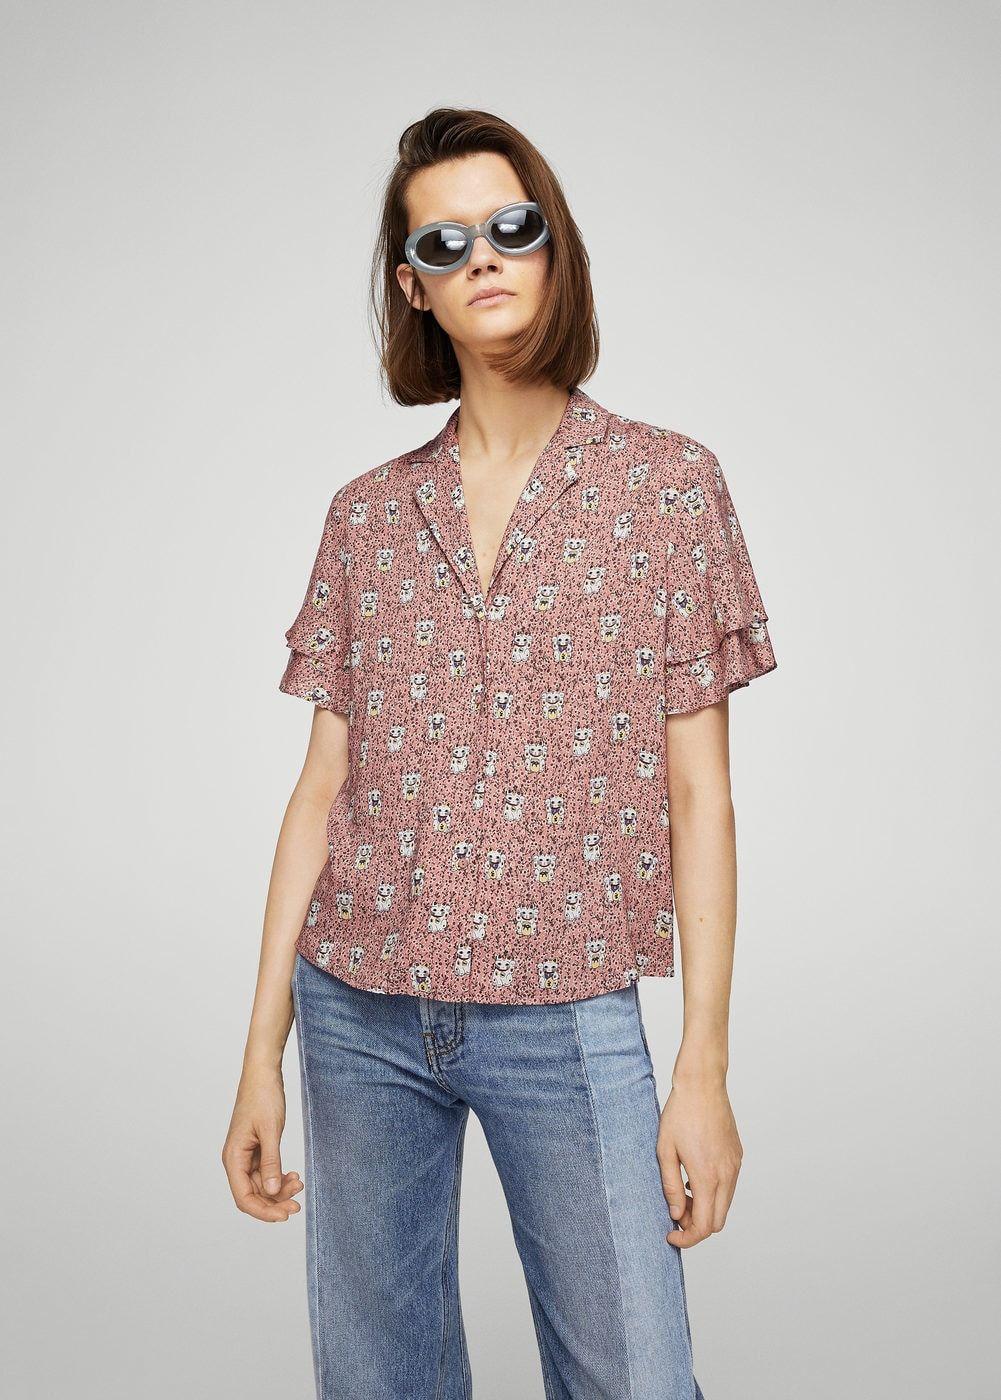 Camisa estampada - Camisas de Mujer | Camisas estampadas, Camisas ...